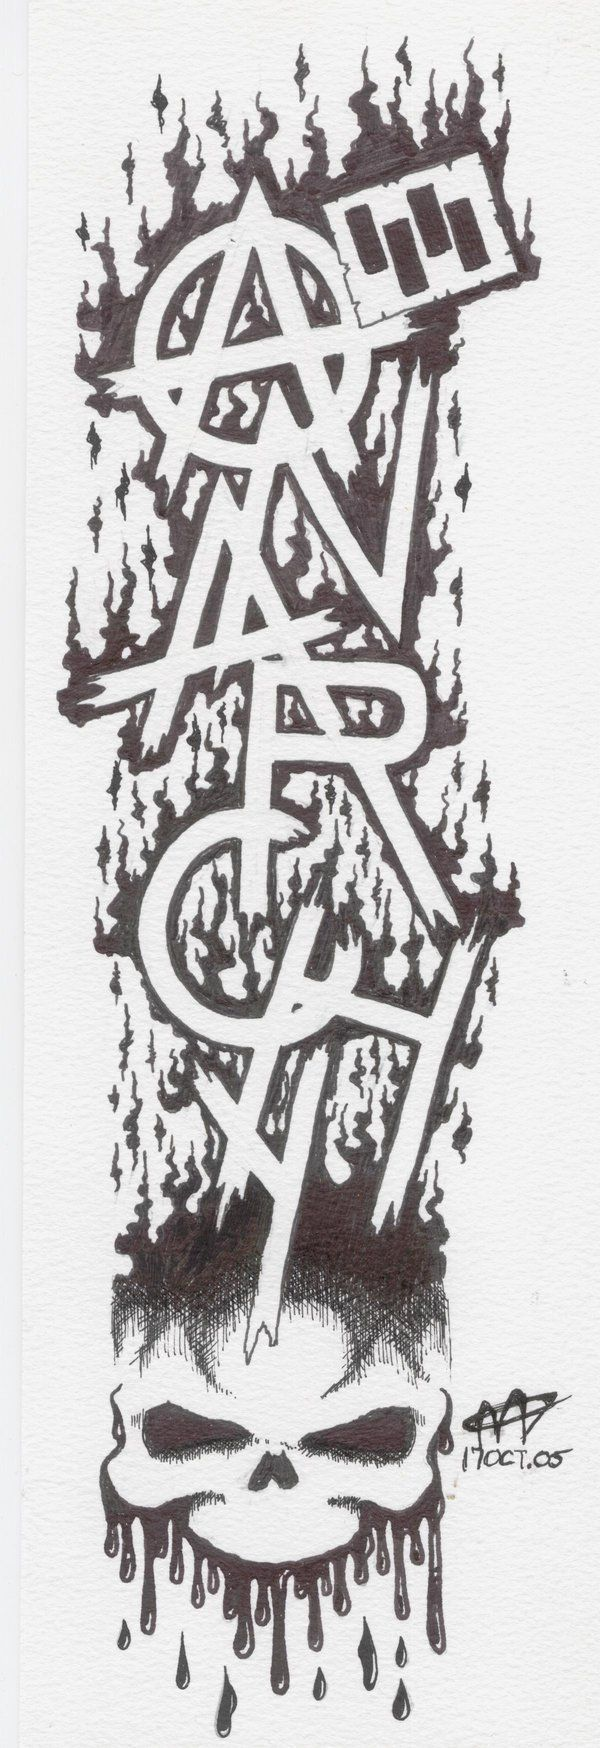 Anarchy symbol resistance poster anarchy symbols and prints buycottarizona